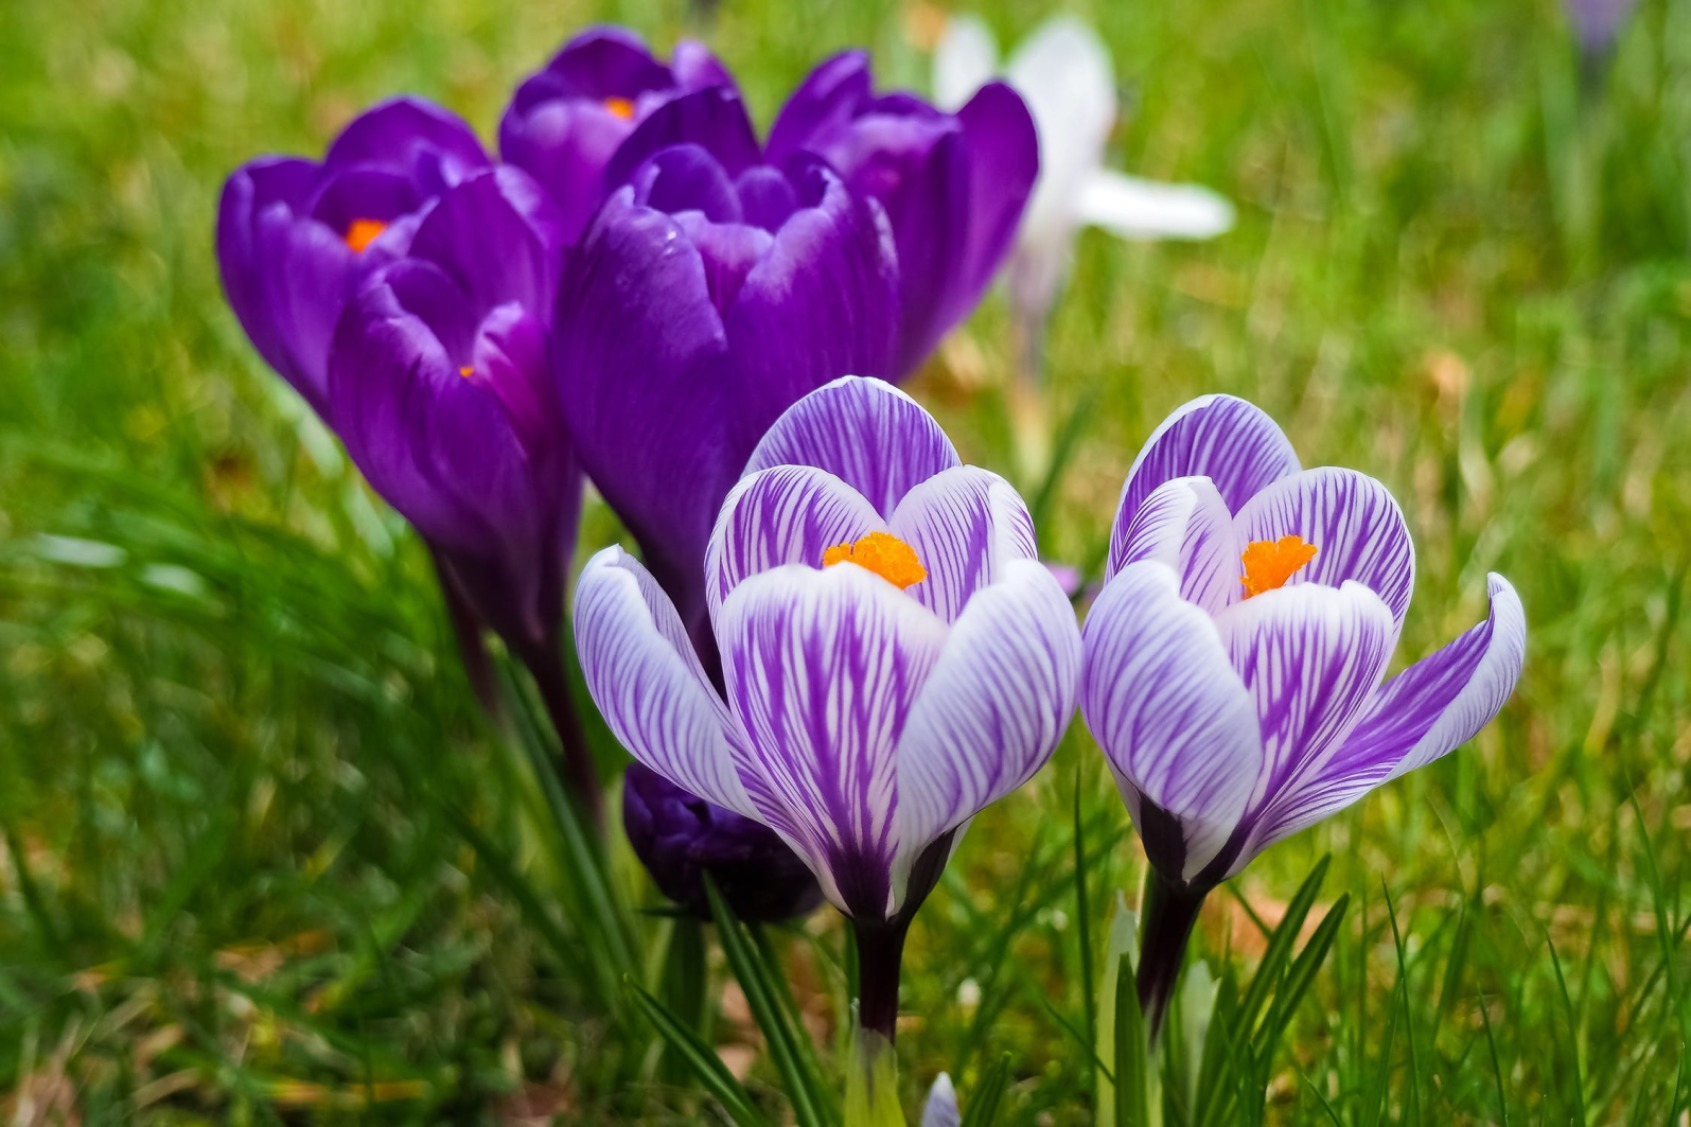 Crocus Flowers - Original image